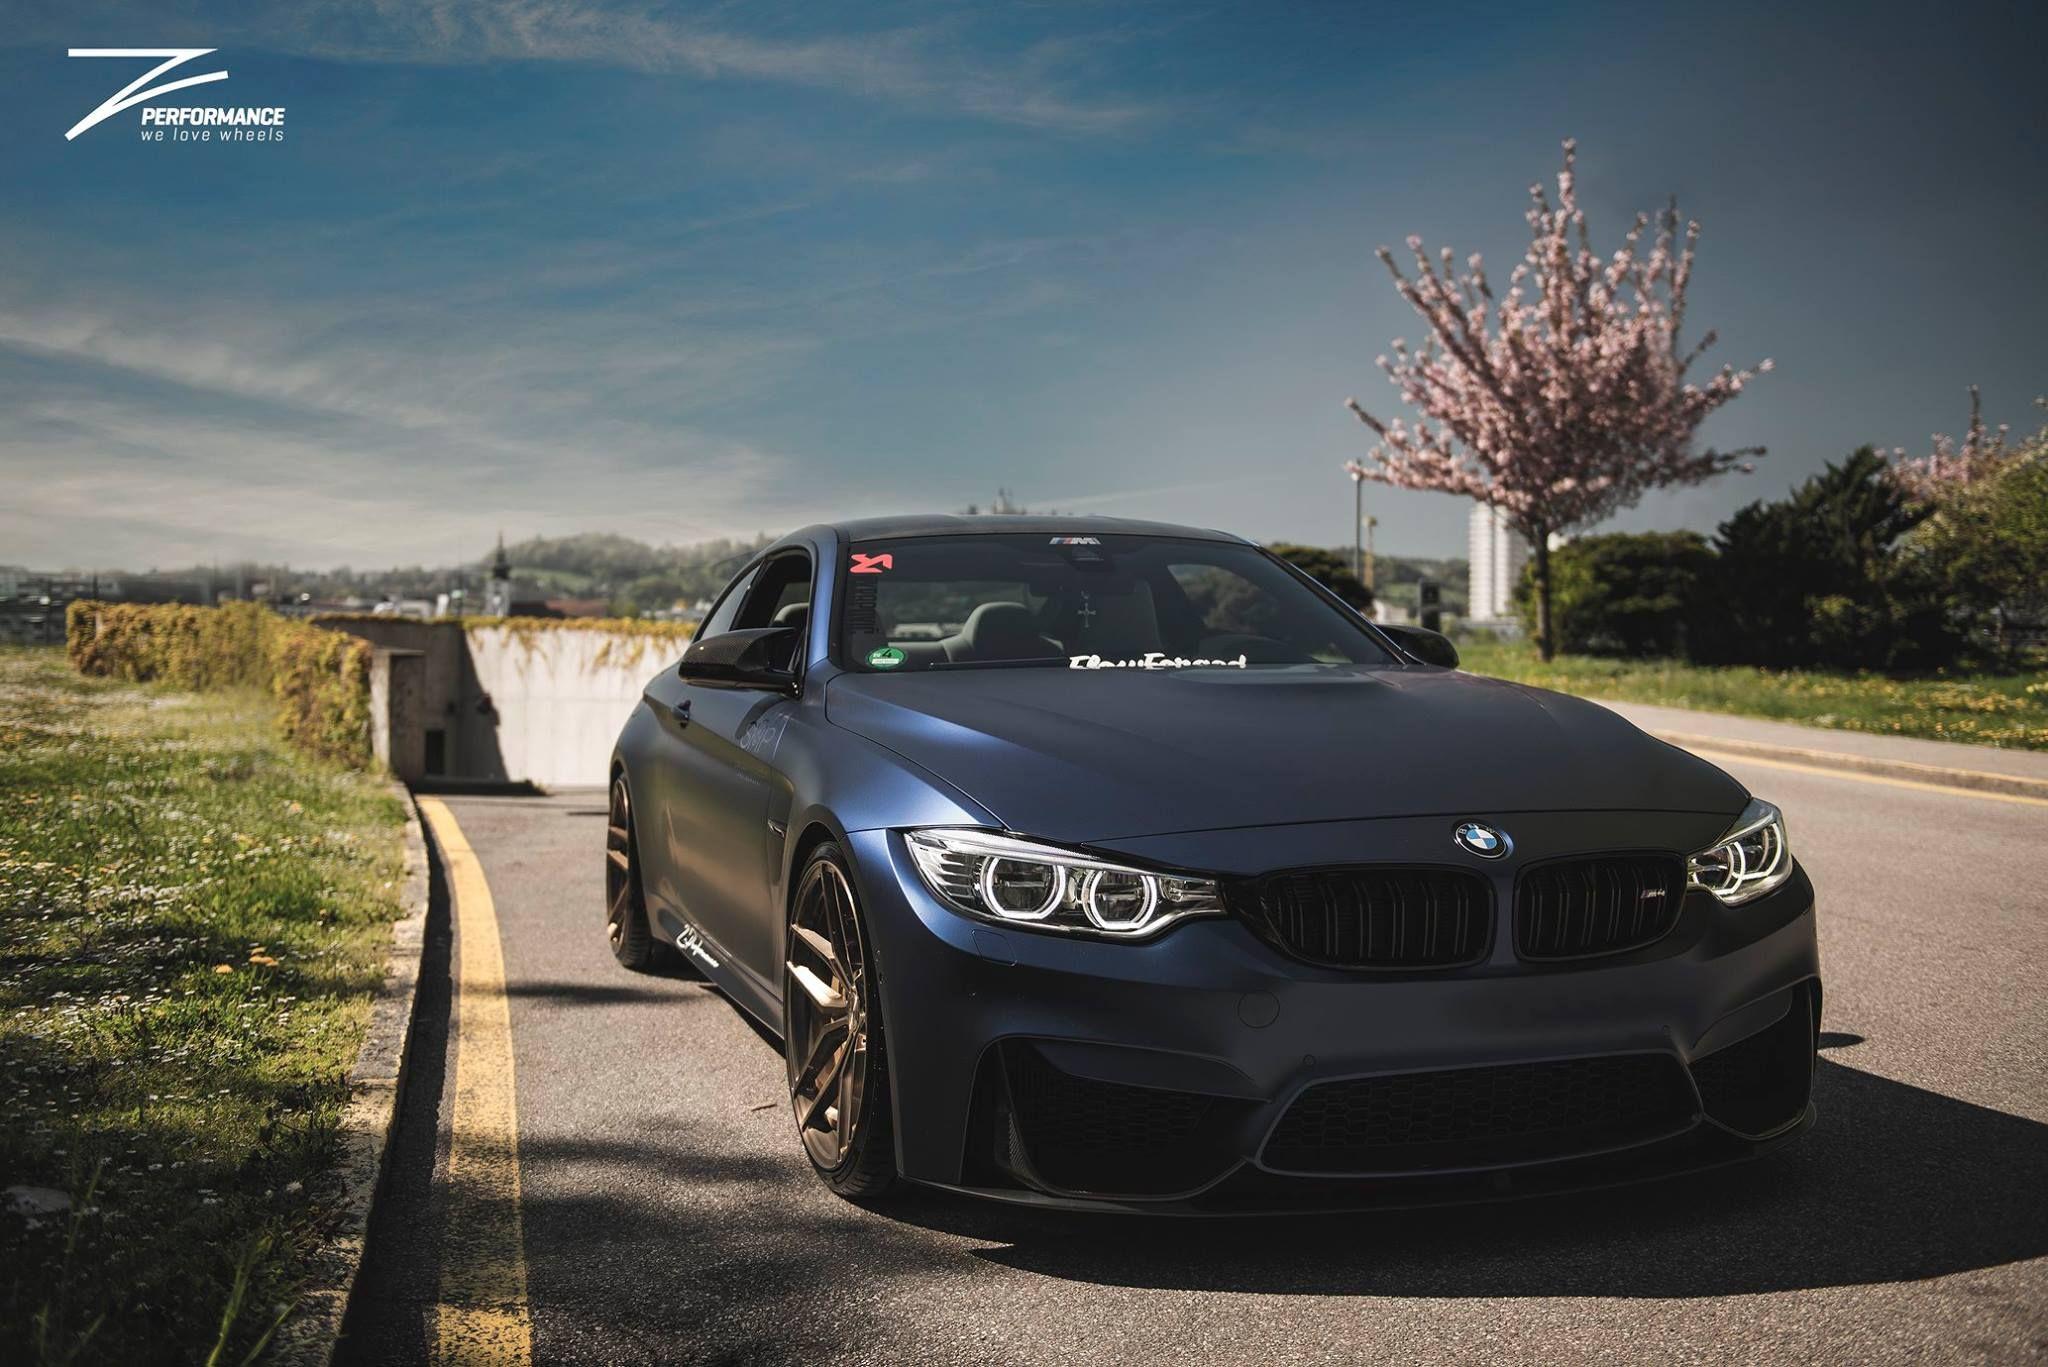 BMW F82 M4 Coupe Provocative Eyes y Hot Burn Badass